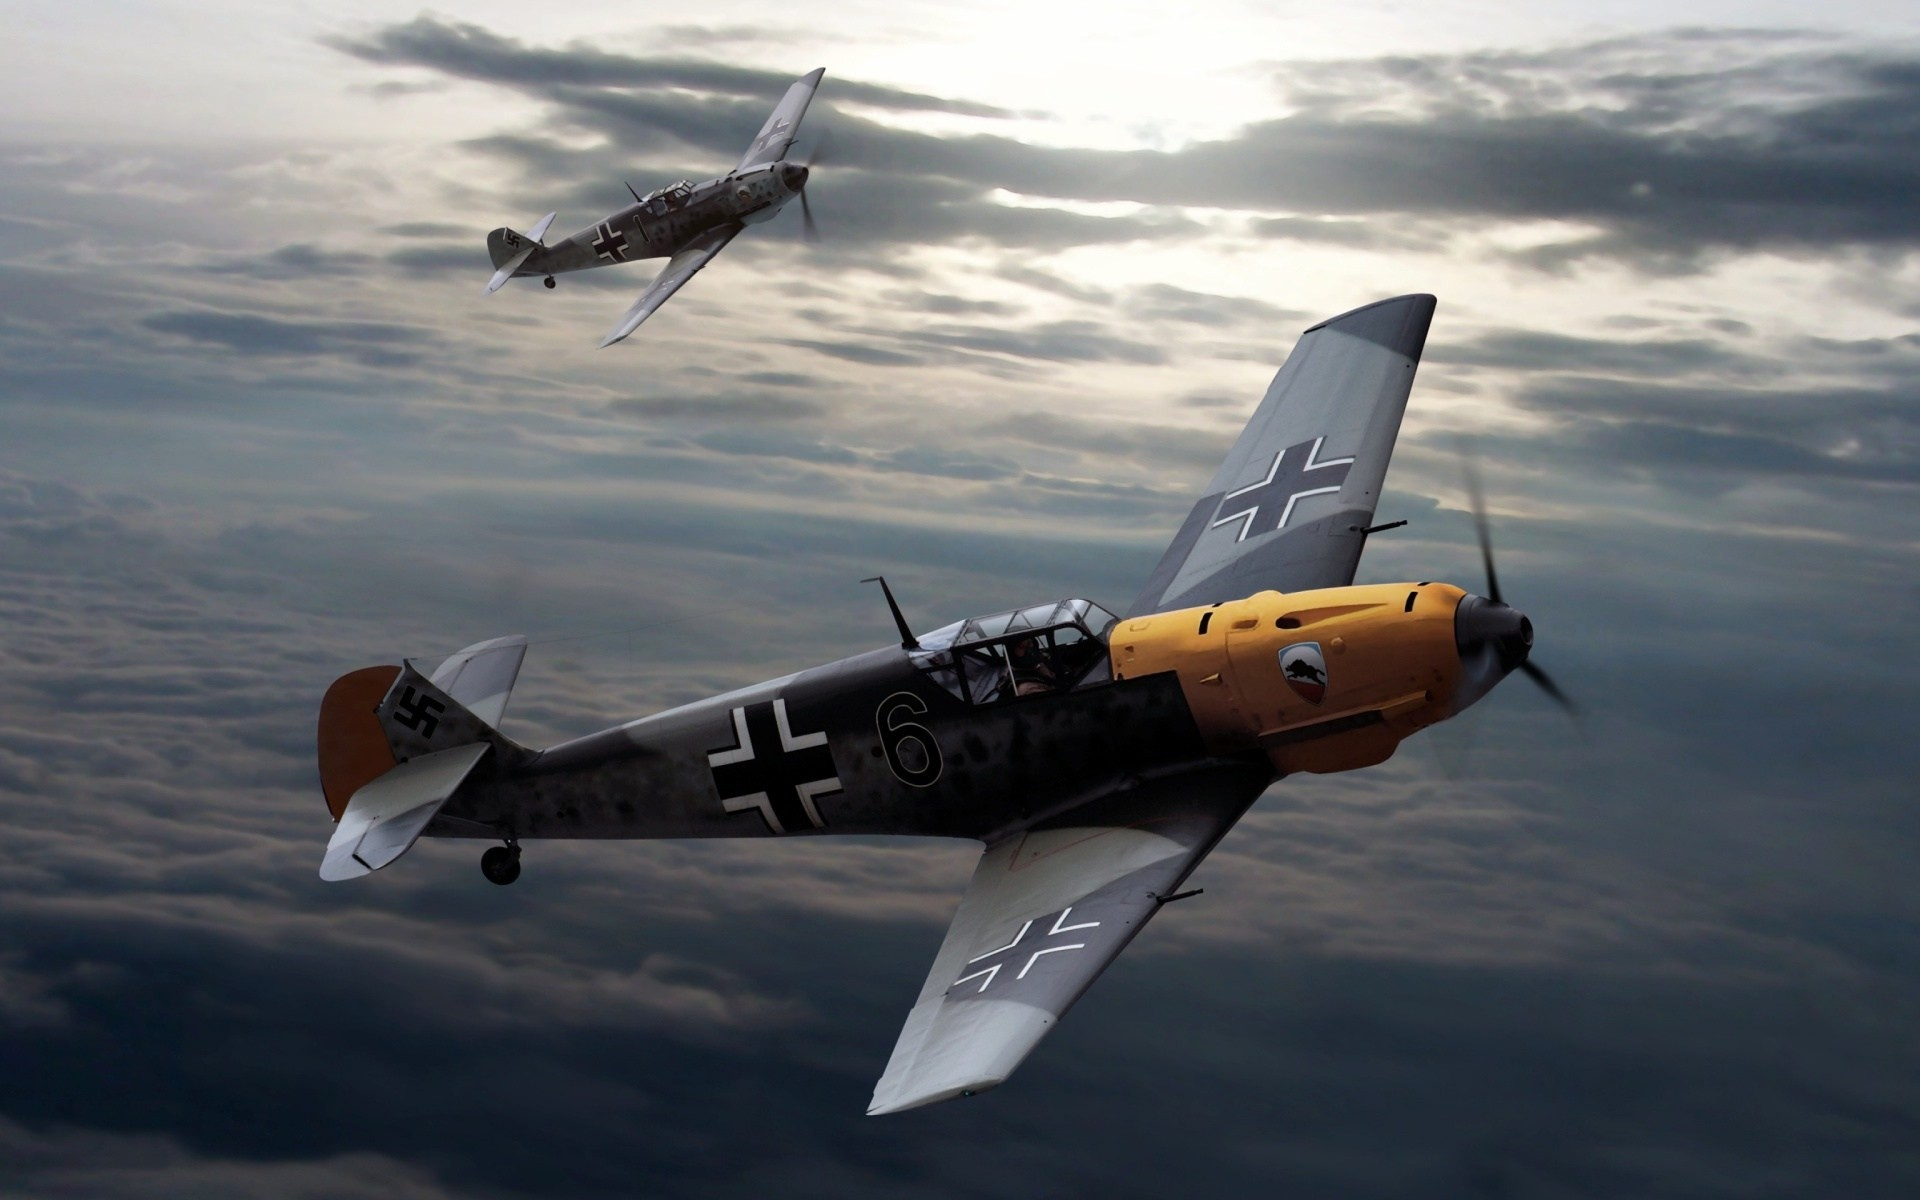 Wwii Fighter Planes Wallpapers 1920×1080 Wallpapersafari